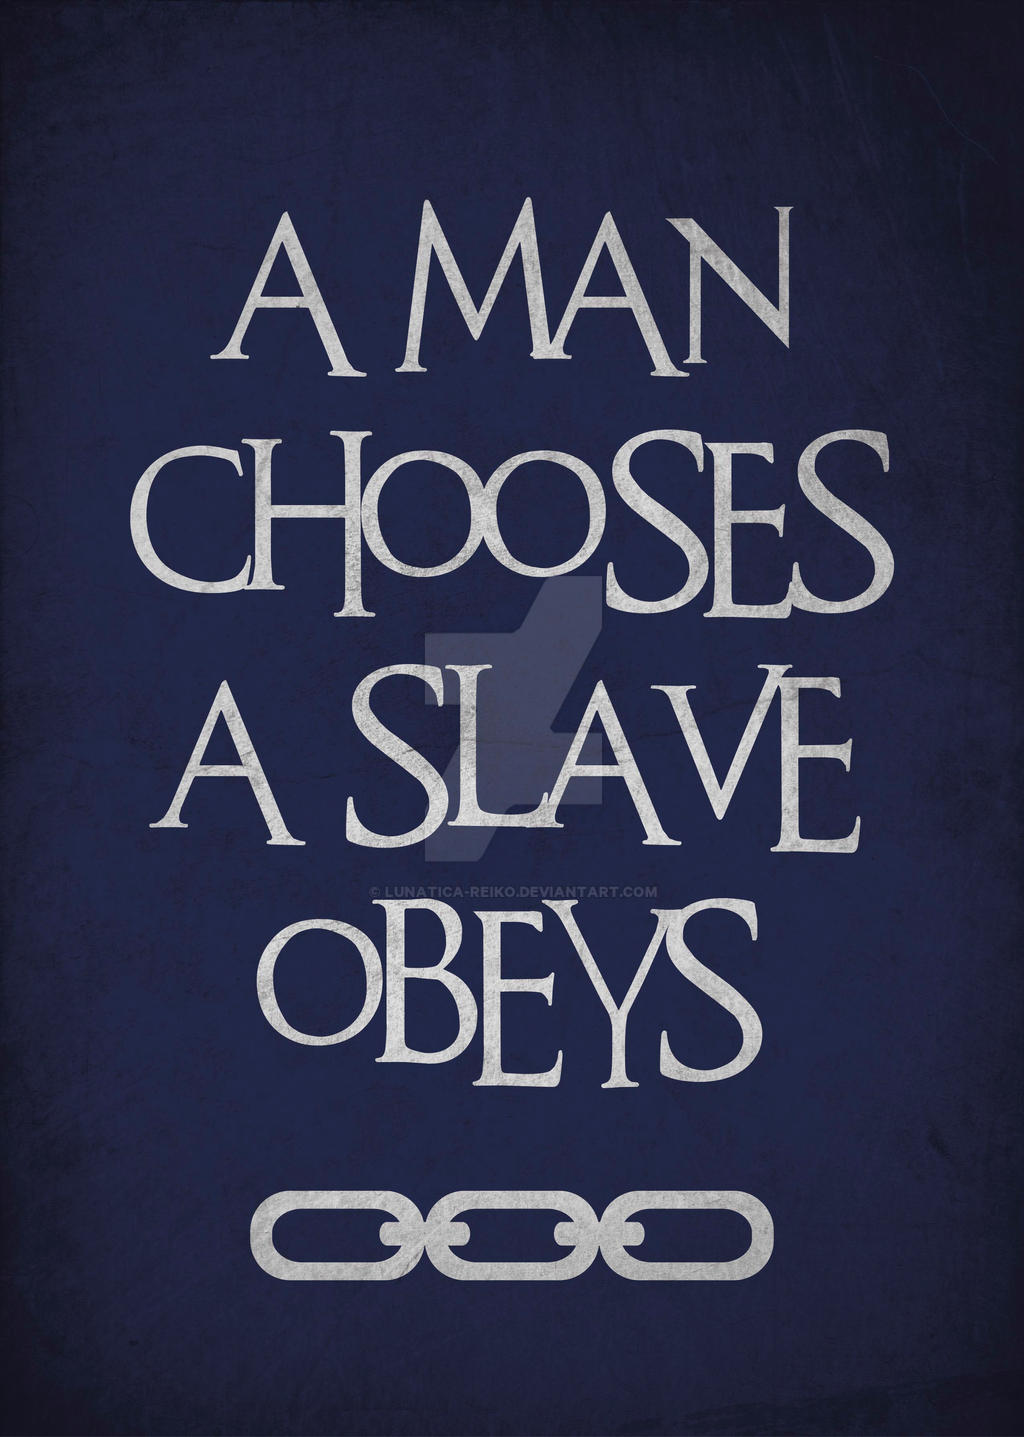 Bioshock A Man Chooses A Slave Obeys By Lunatica Reiko On